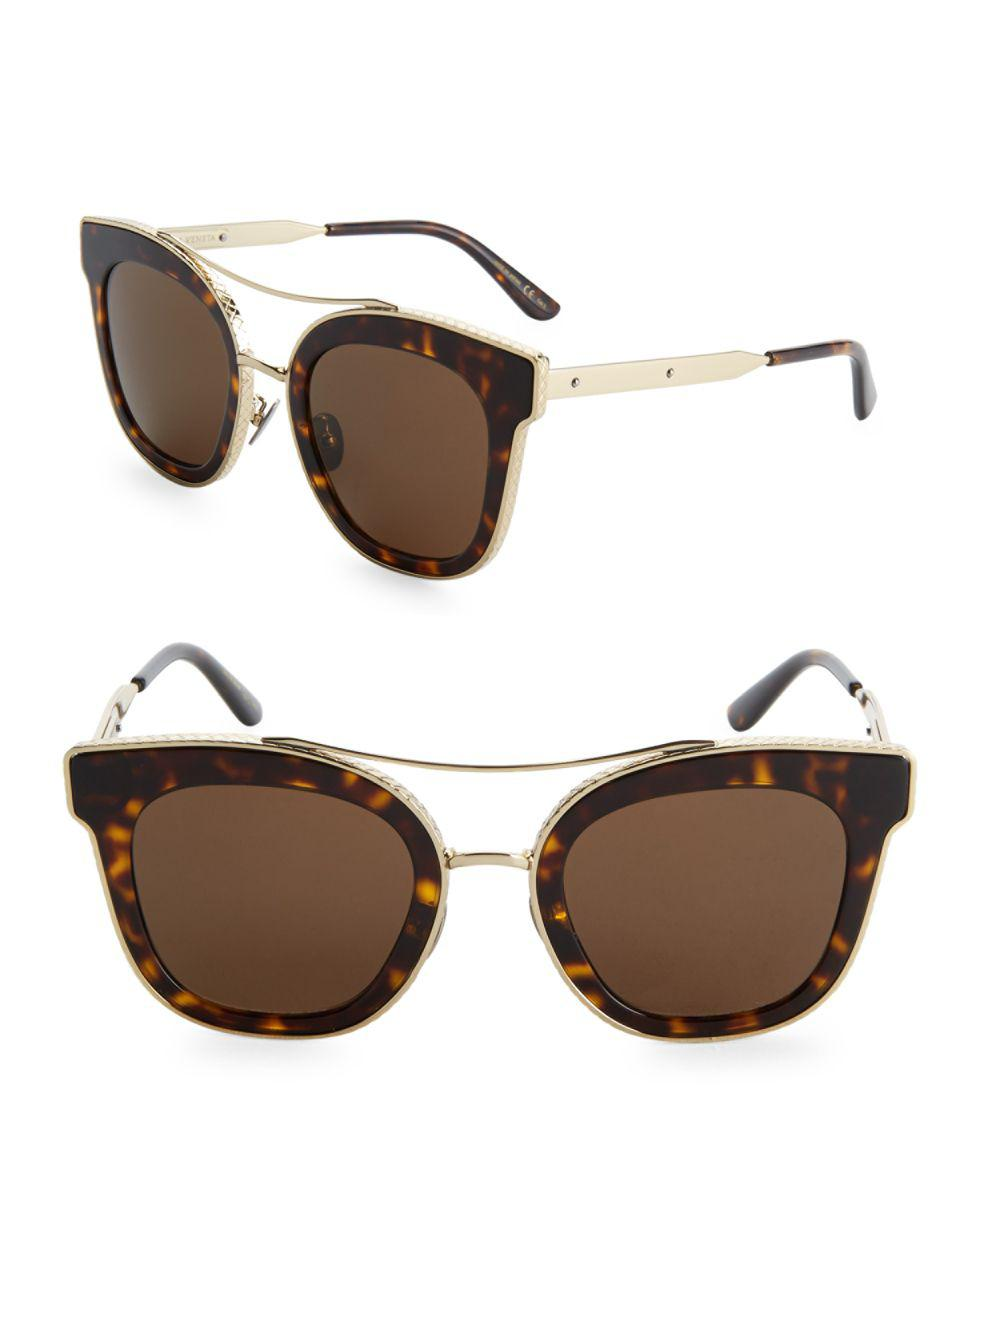 Bottega Veneta Tinted cat-eye sunglasses cJ0Pz